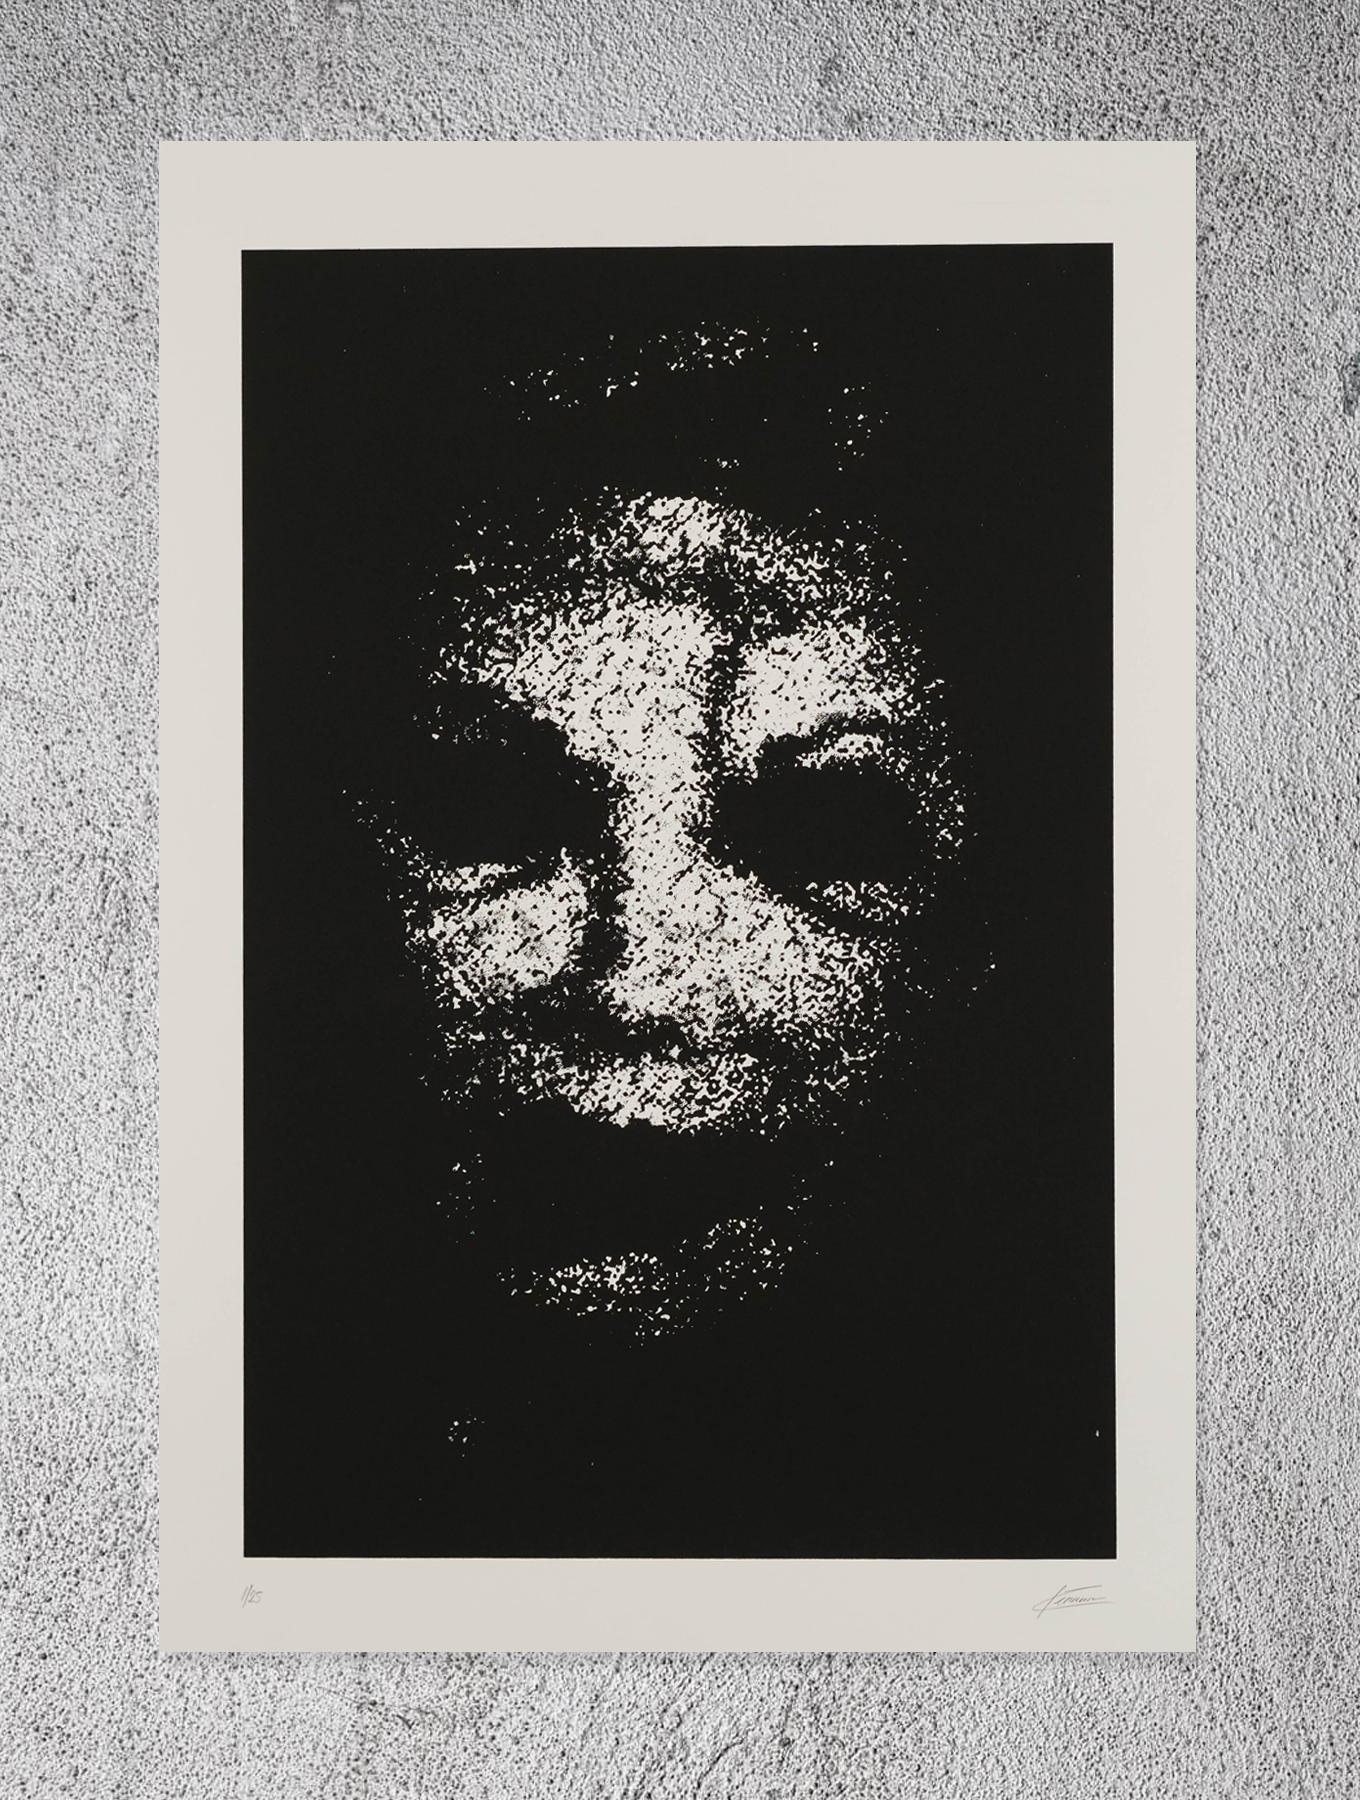 tank-atelier-estampes-serigraphie-freaksJoanR